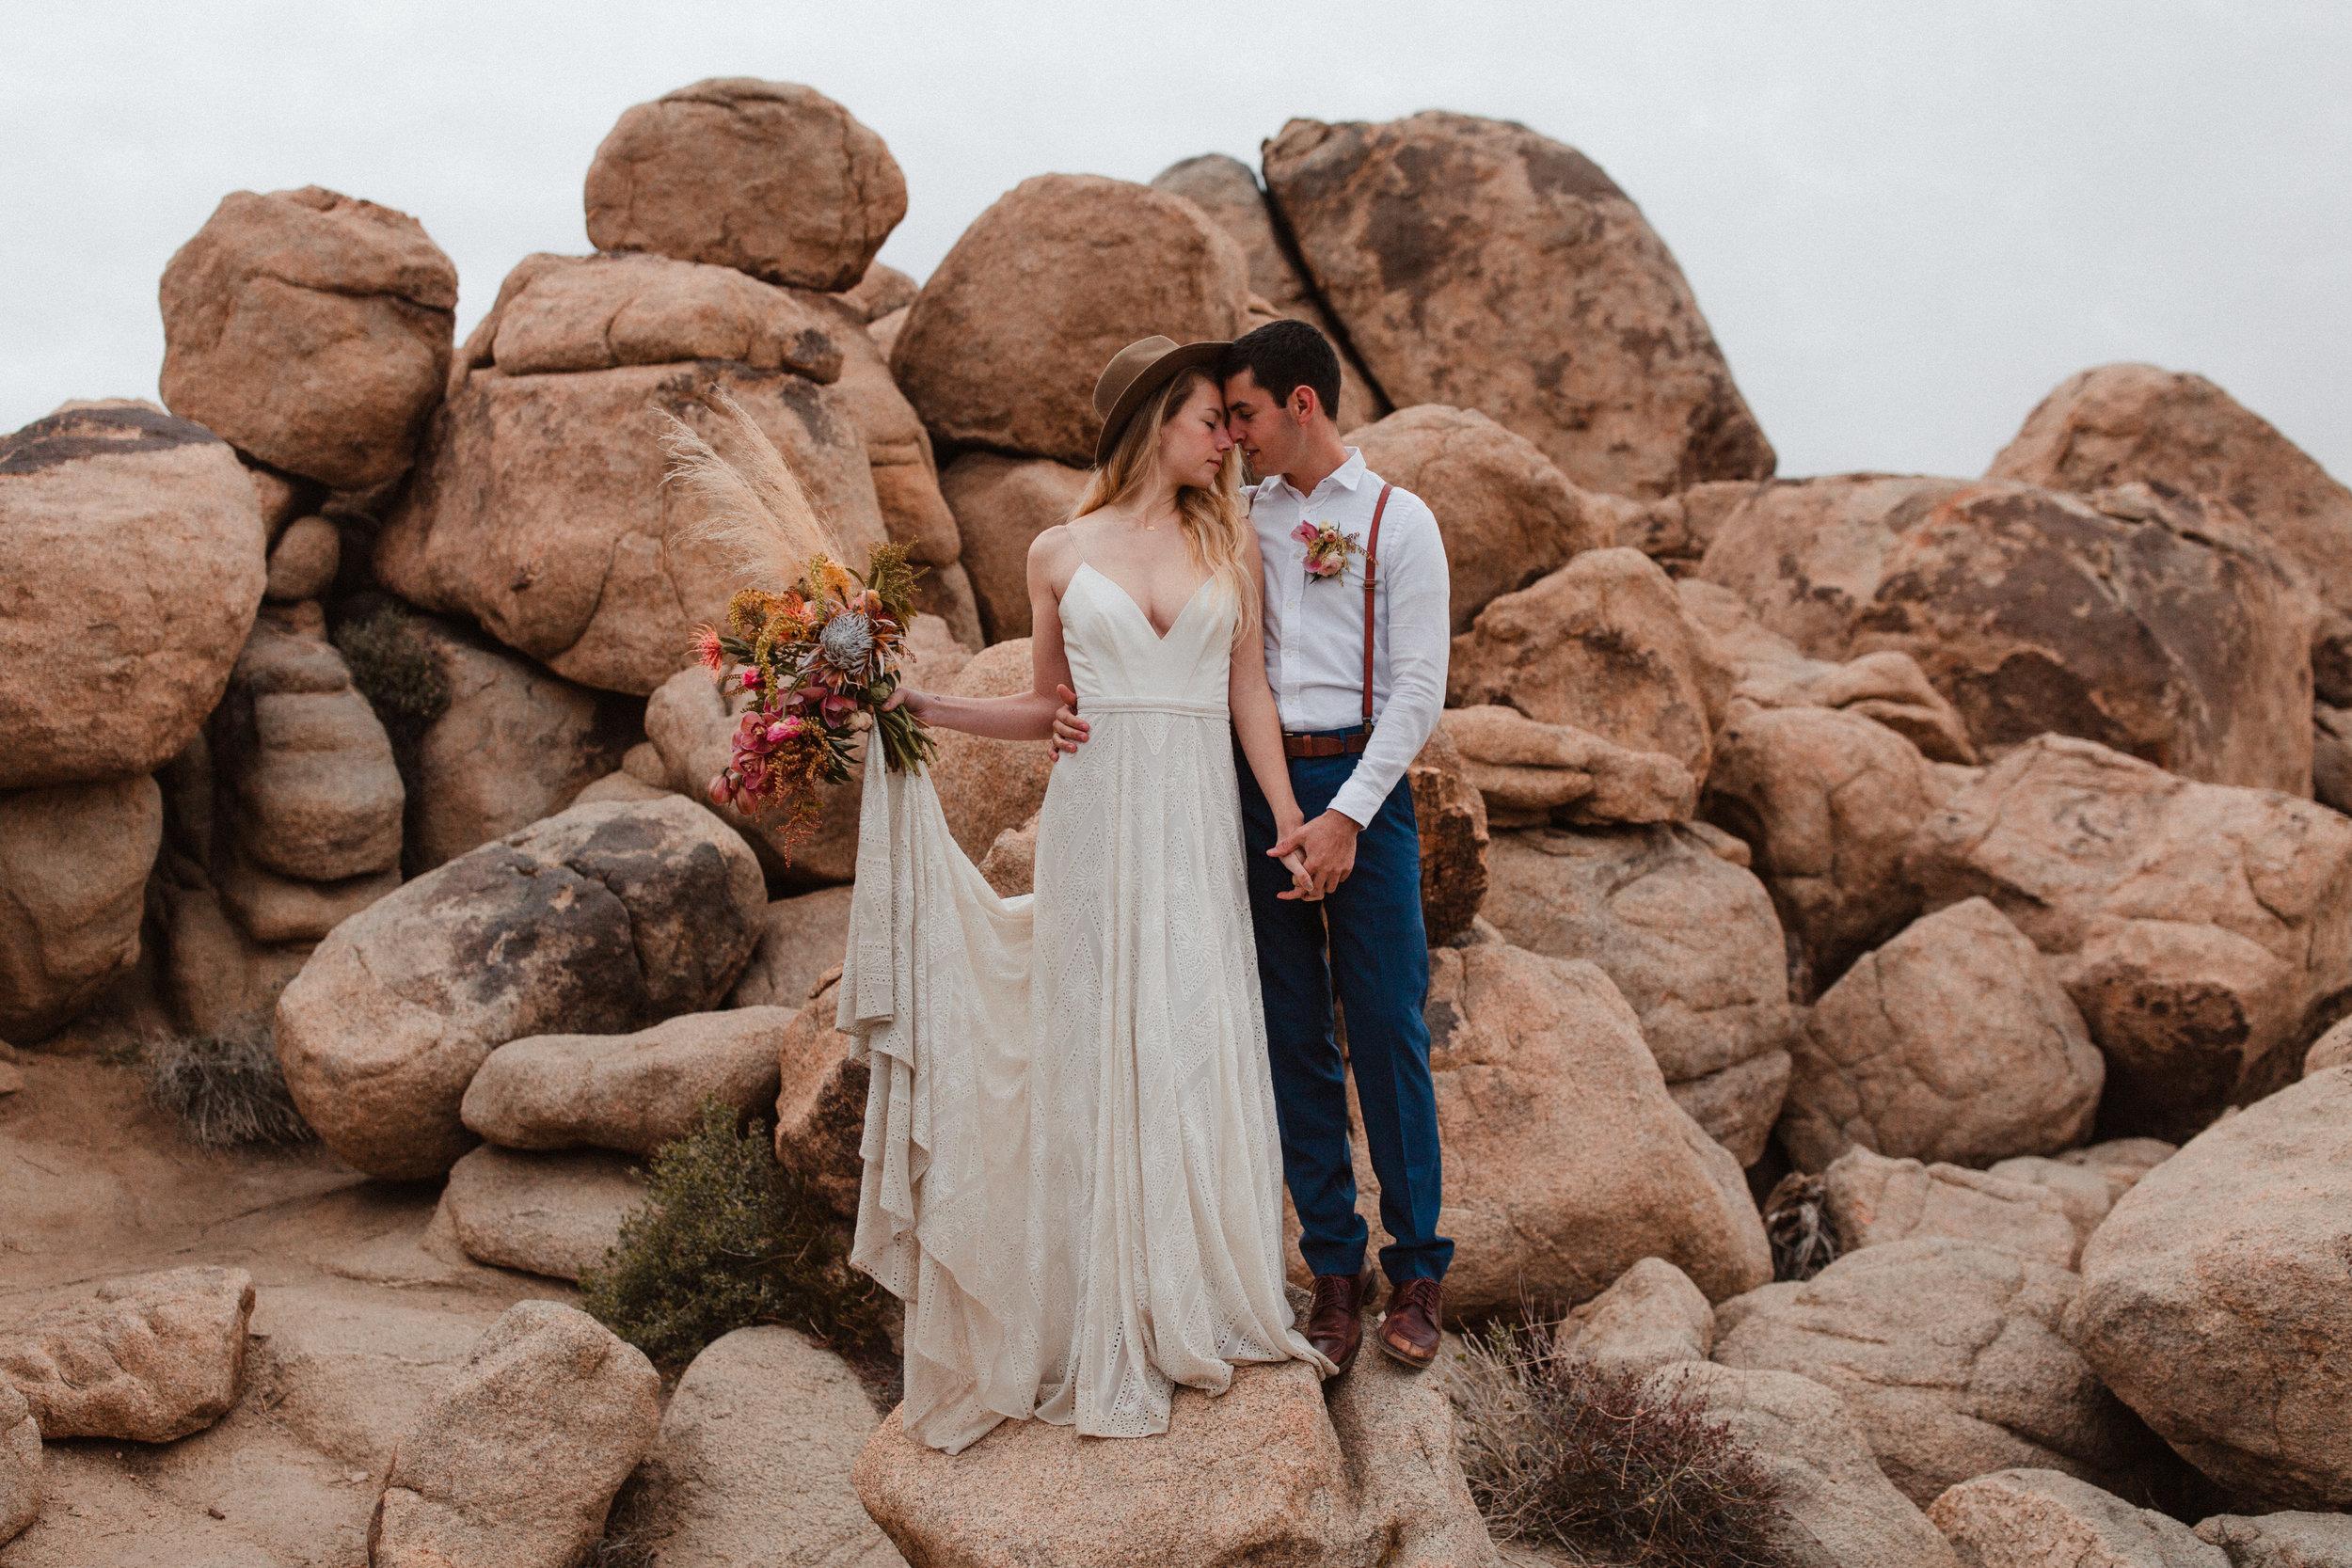 Hannah + Cole | Romantic Joshua Tree Elopement at Sunset